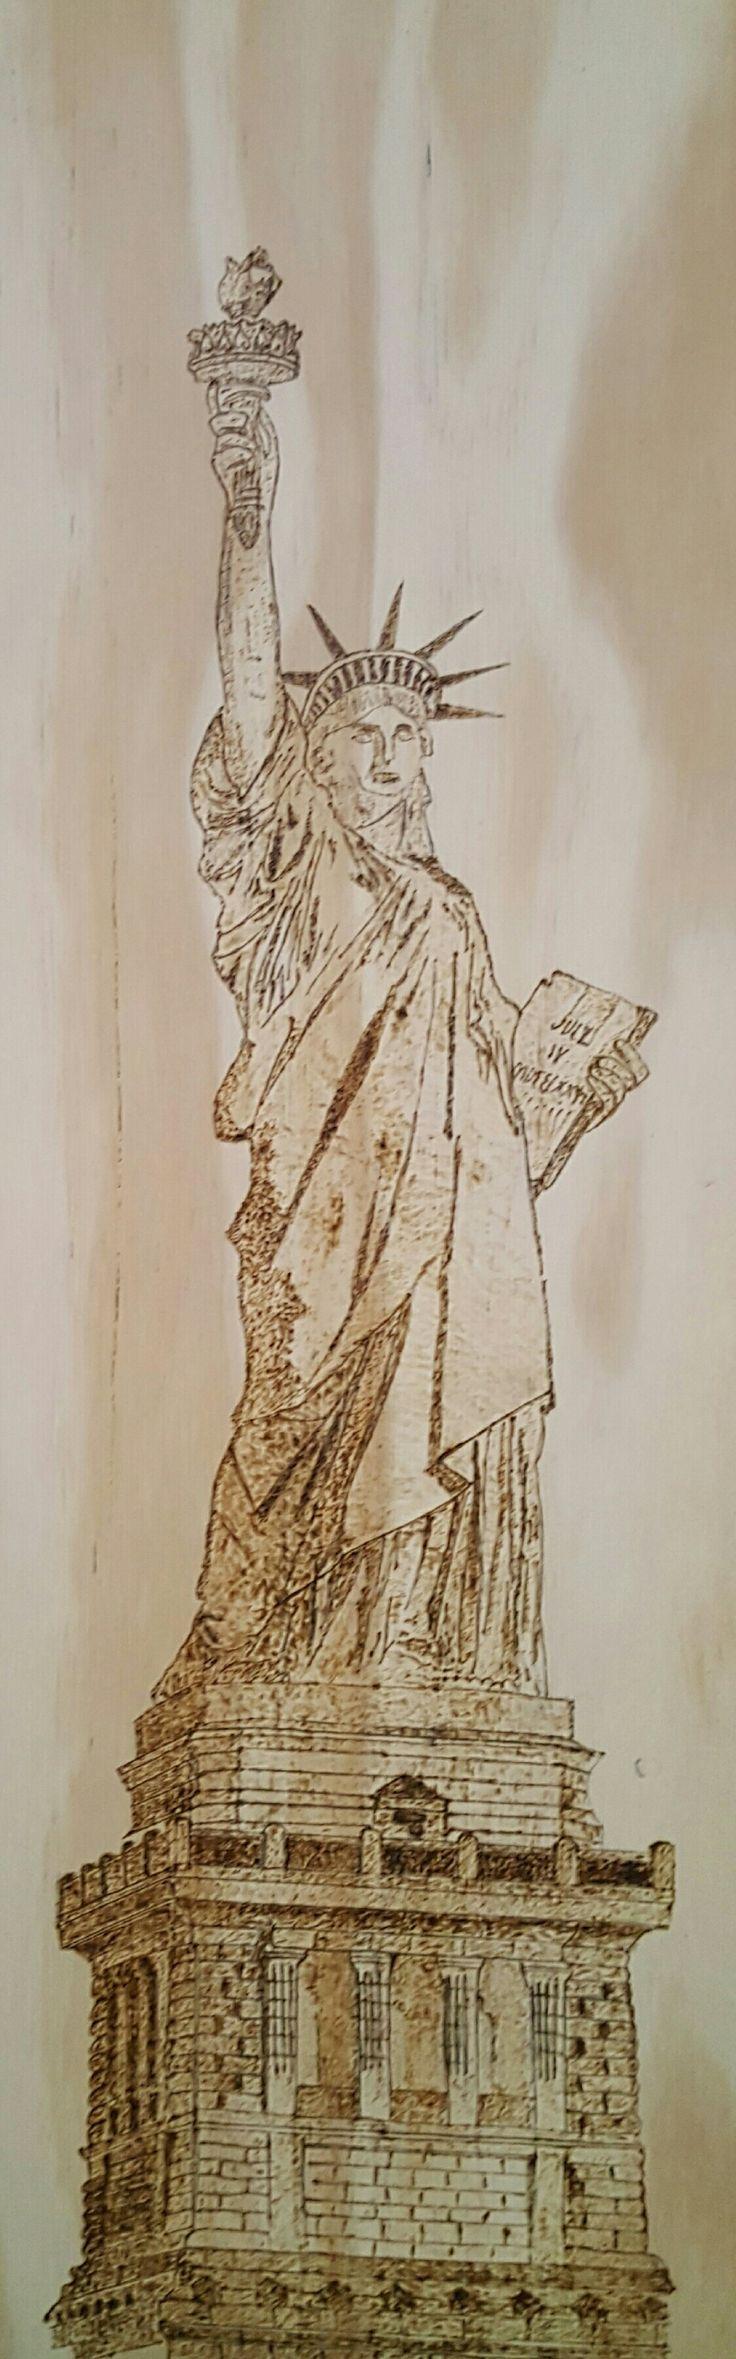 Statue of liberty pyrography by hady al hayek